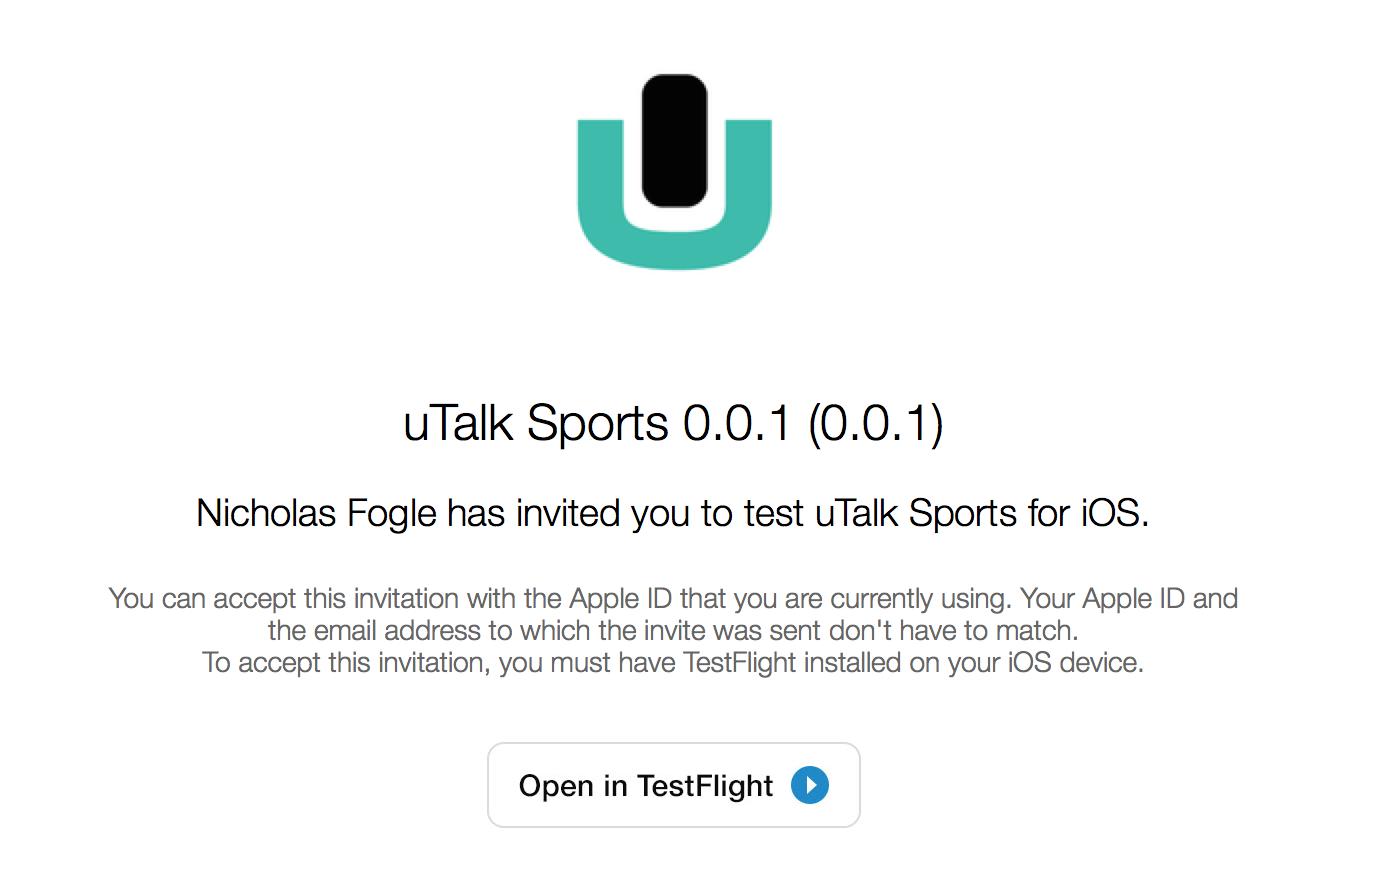 uTalk Sports iOS